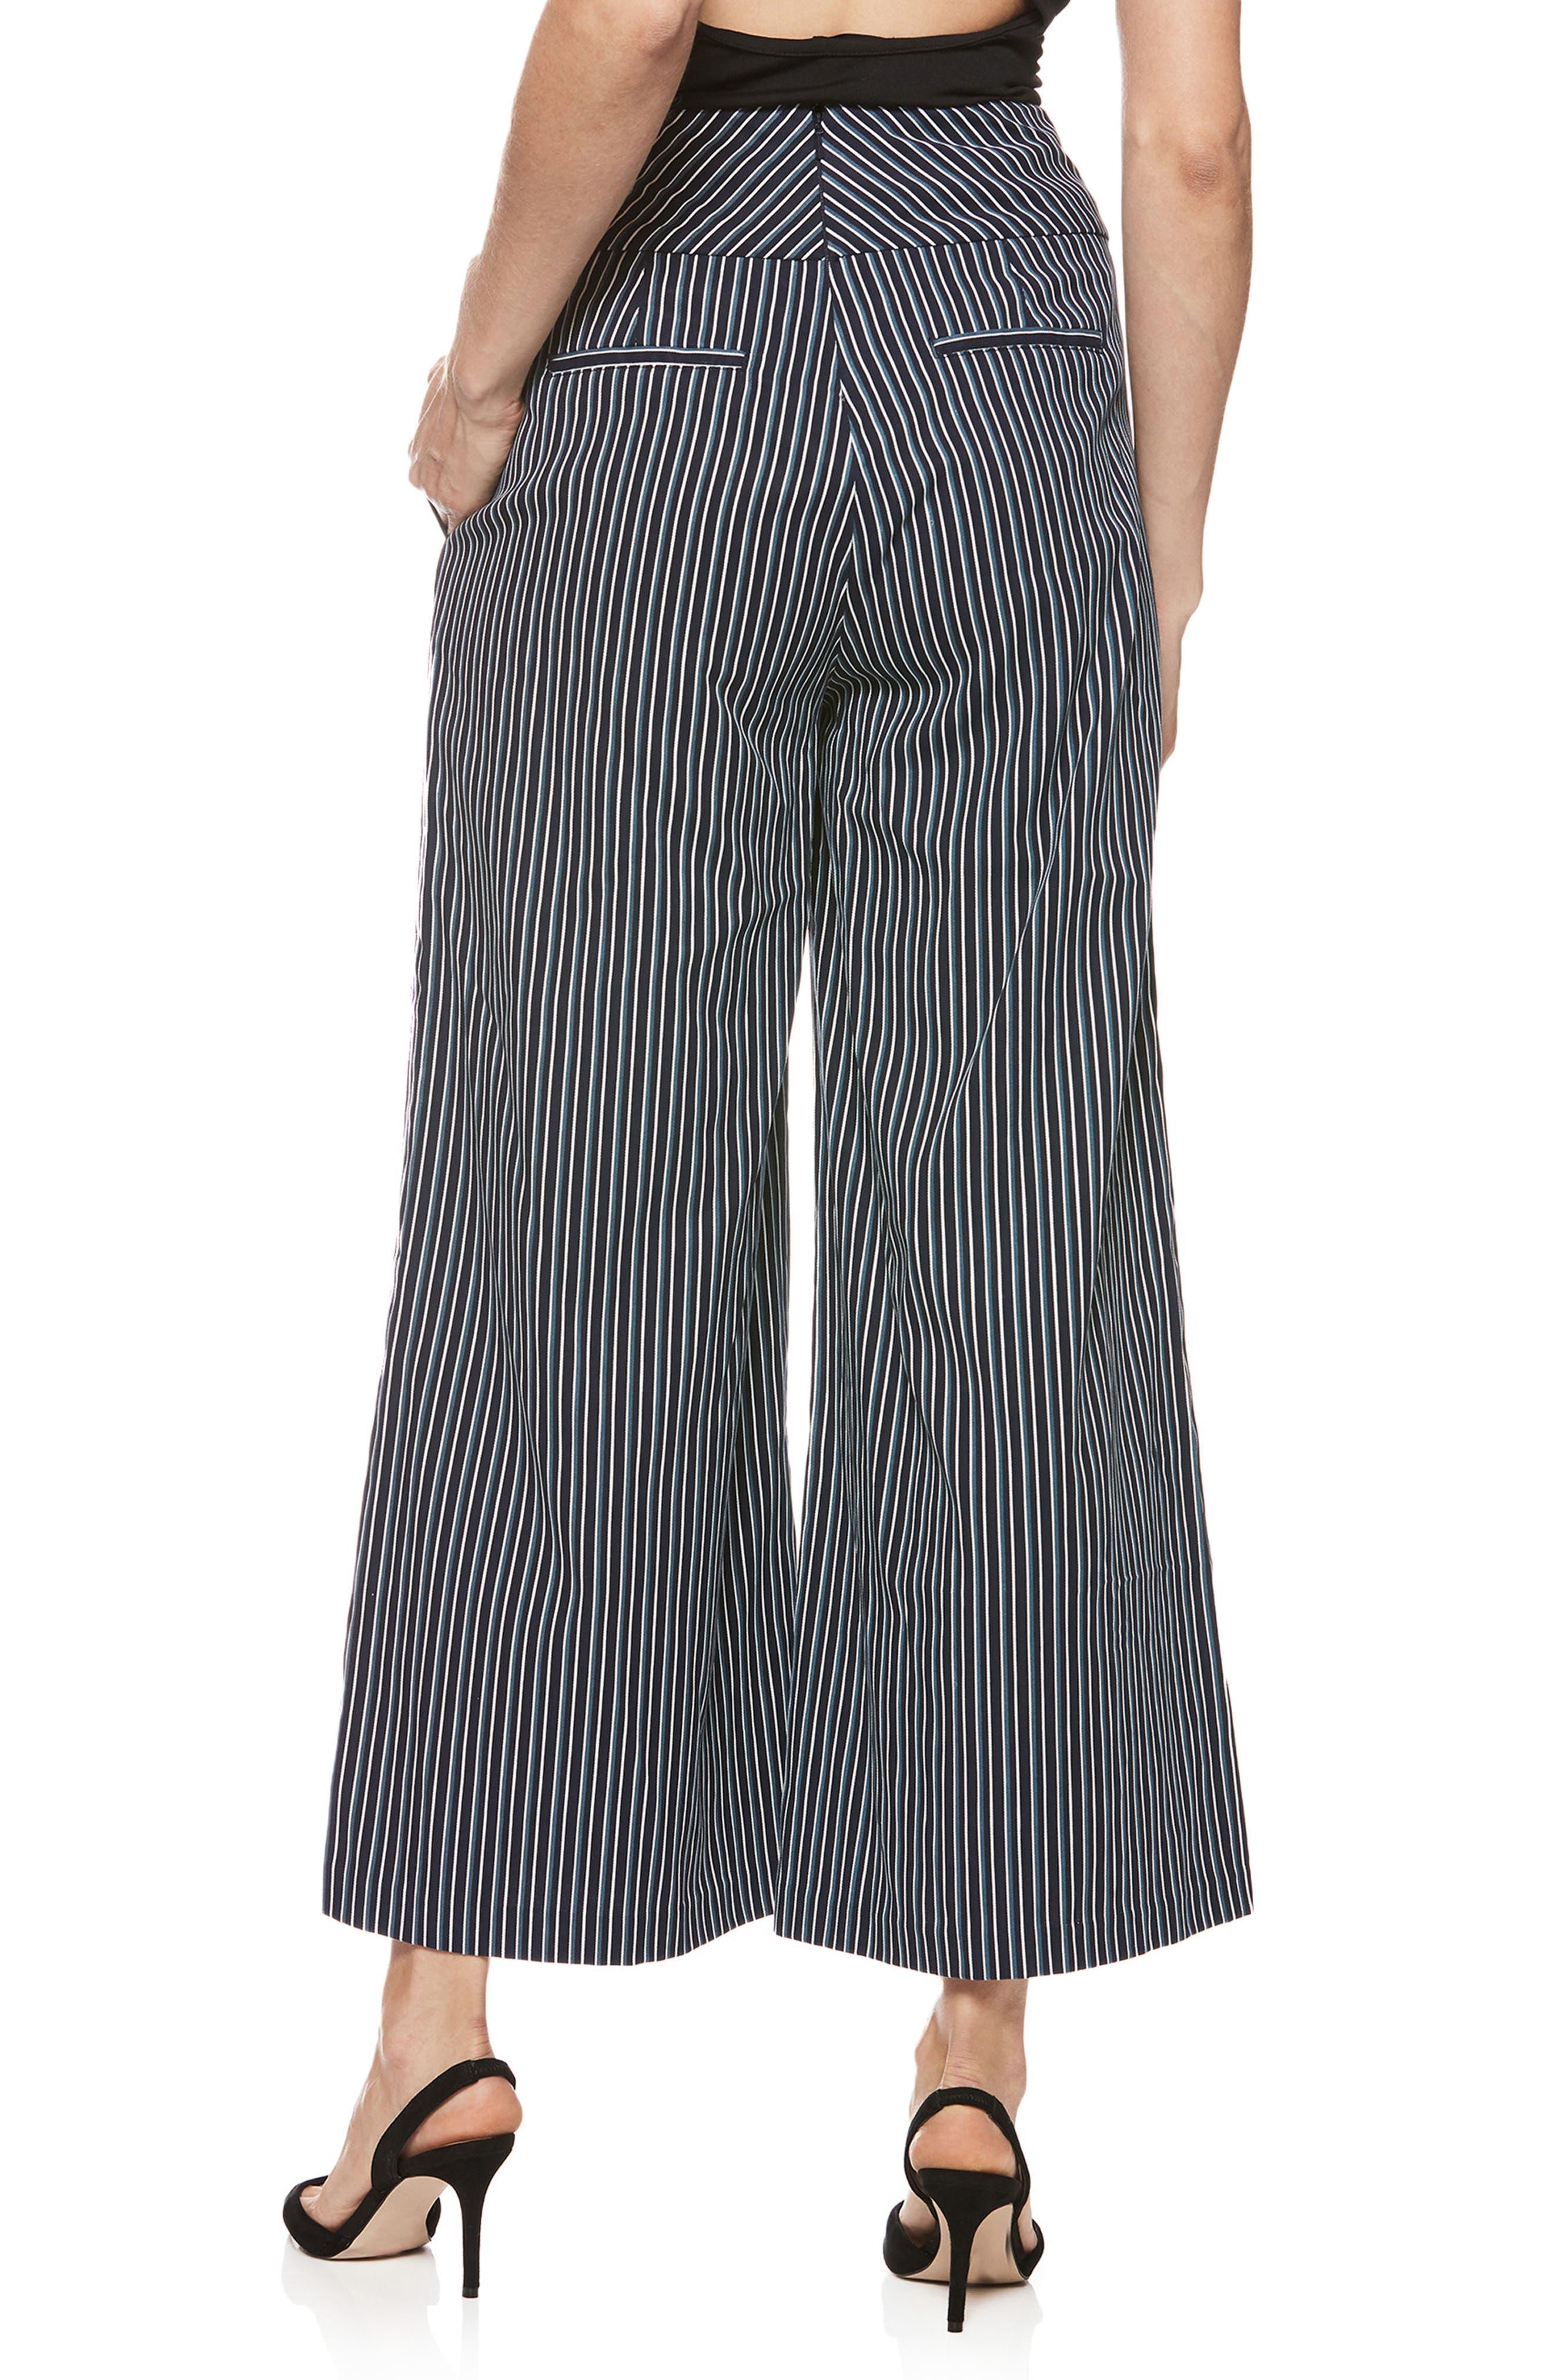 Charisma Pants,                             Alternate thumbnail 2, color,